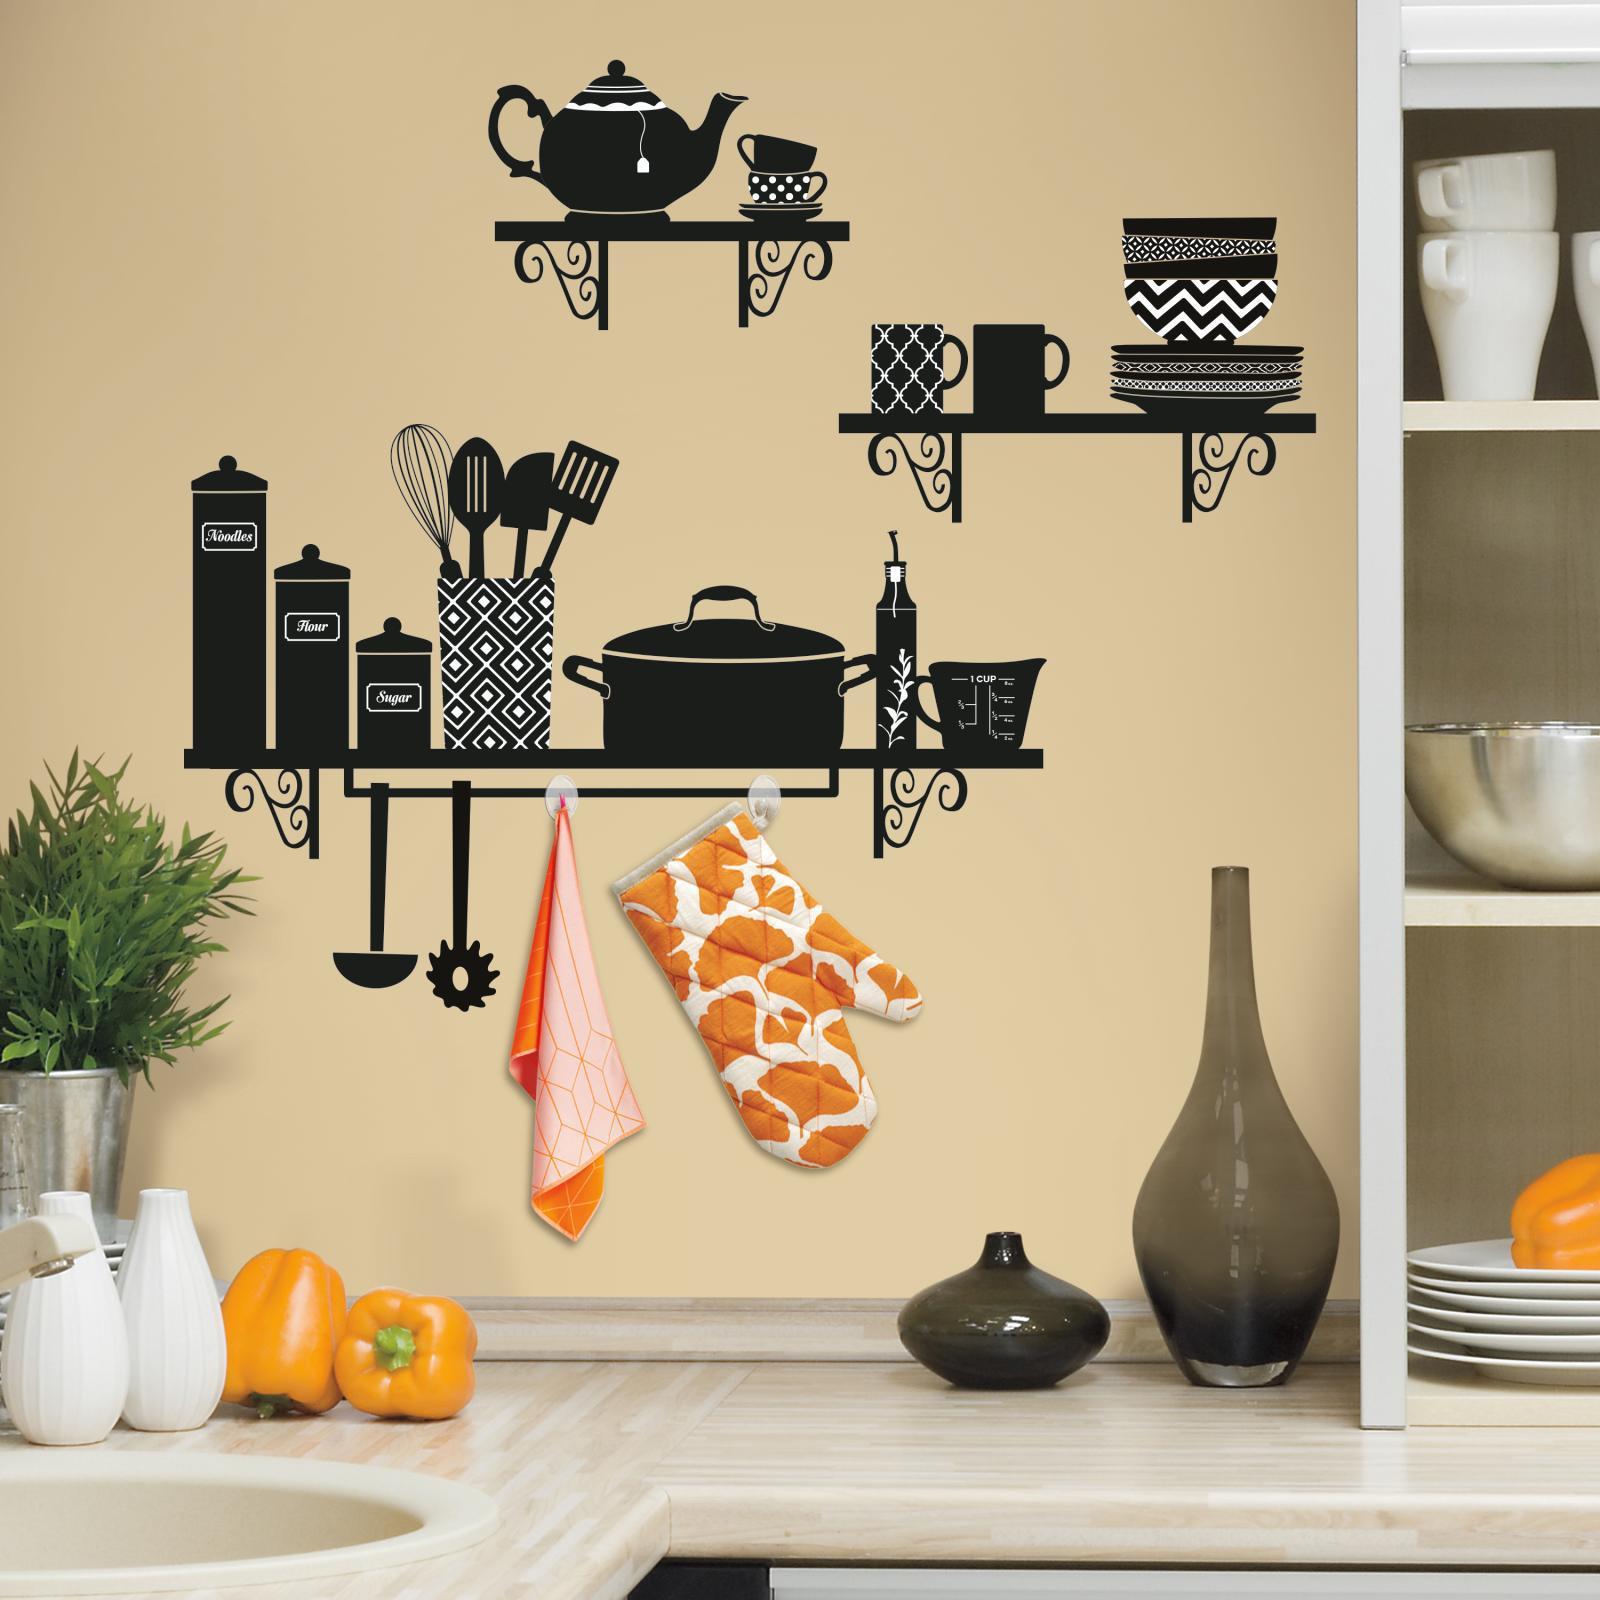 6 Desain Stiker Wallpaper Dinding Dapur Cantik Nirwana